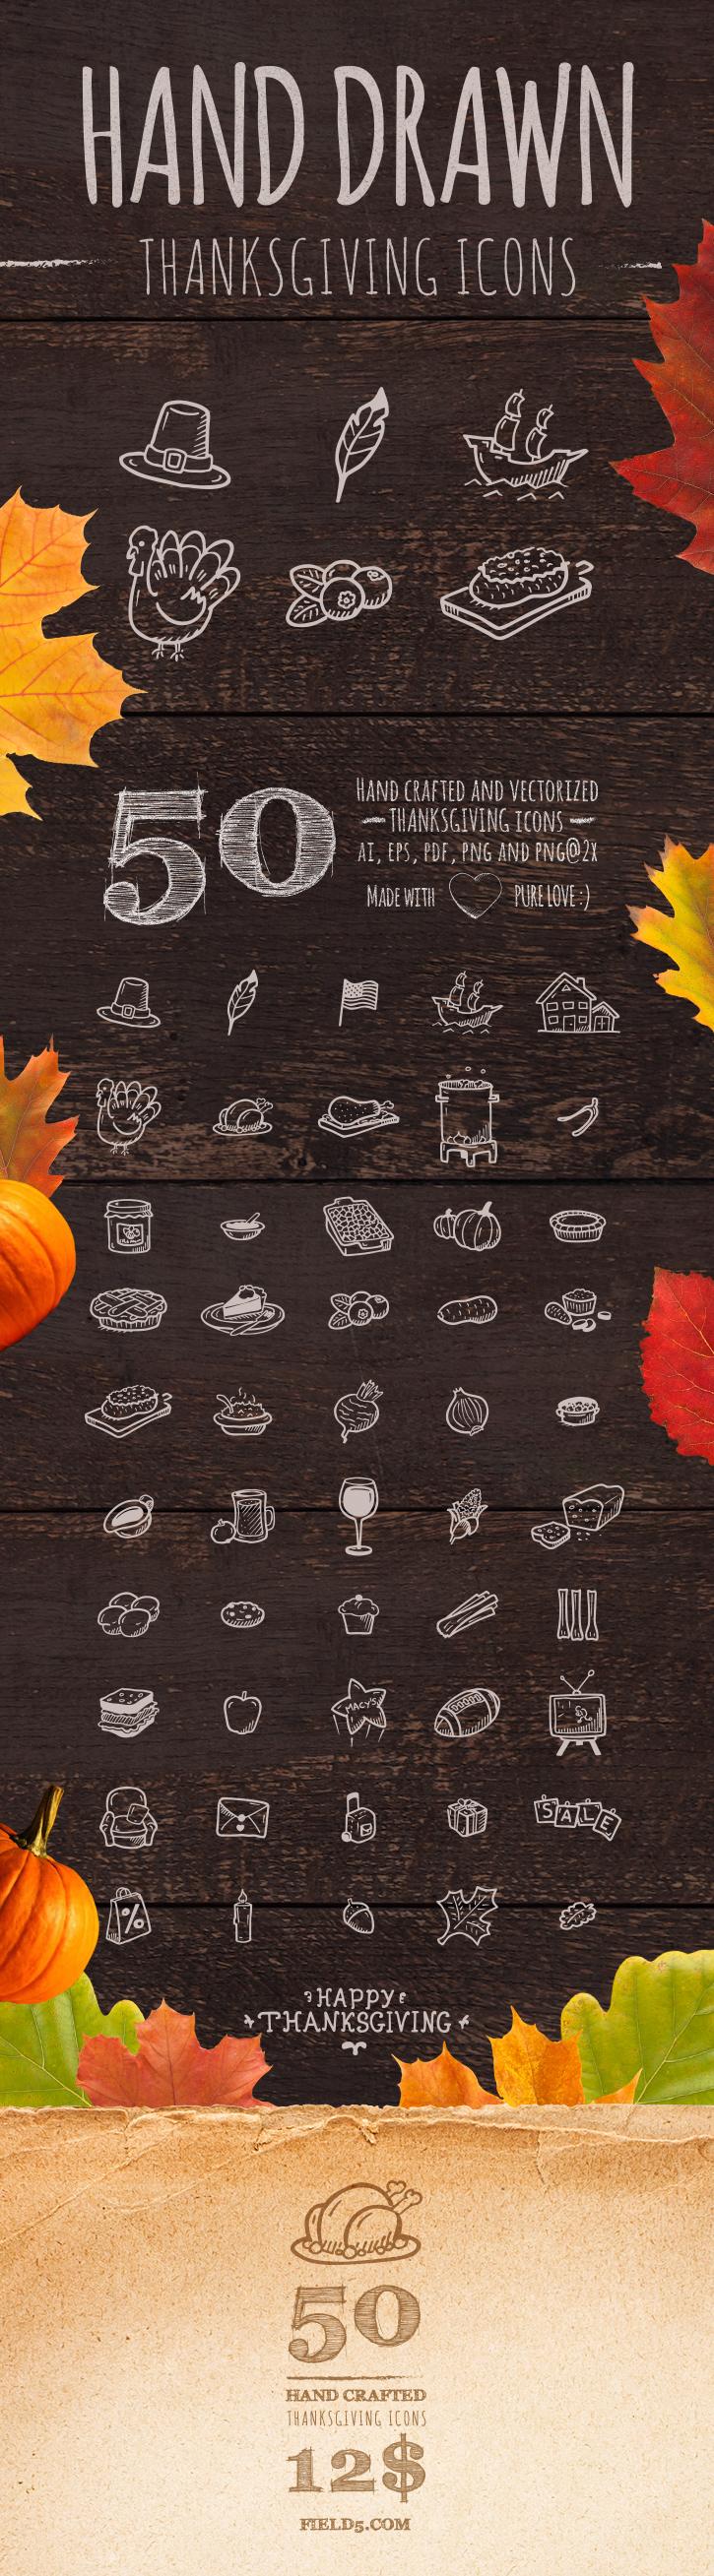 Hand Drawn Thanksgiving Icons